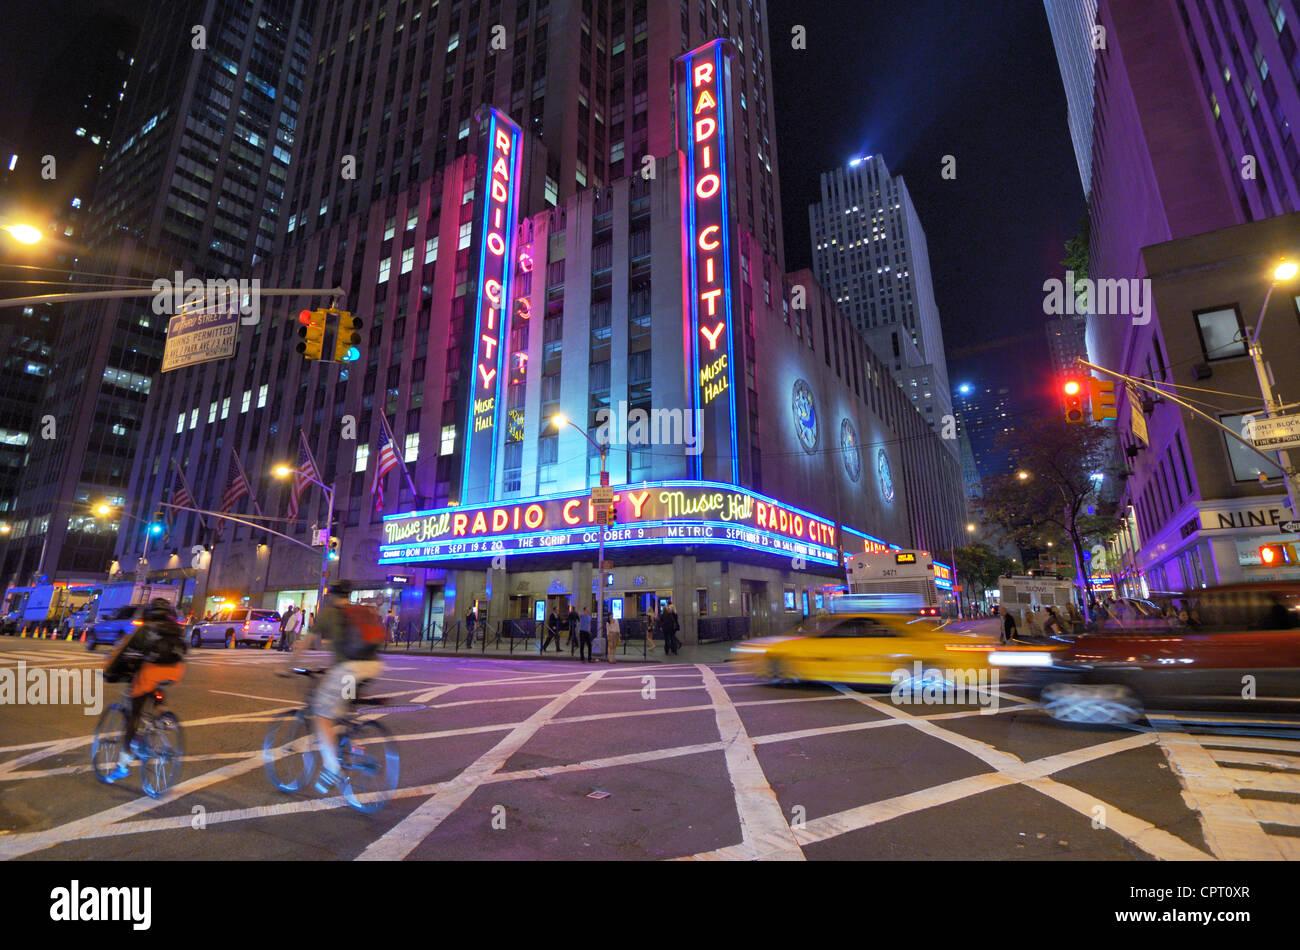 Radio City Music Hall, a famed venue and a New York City landmark. - Stock Image